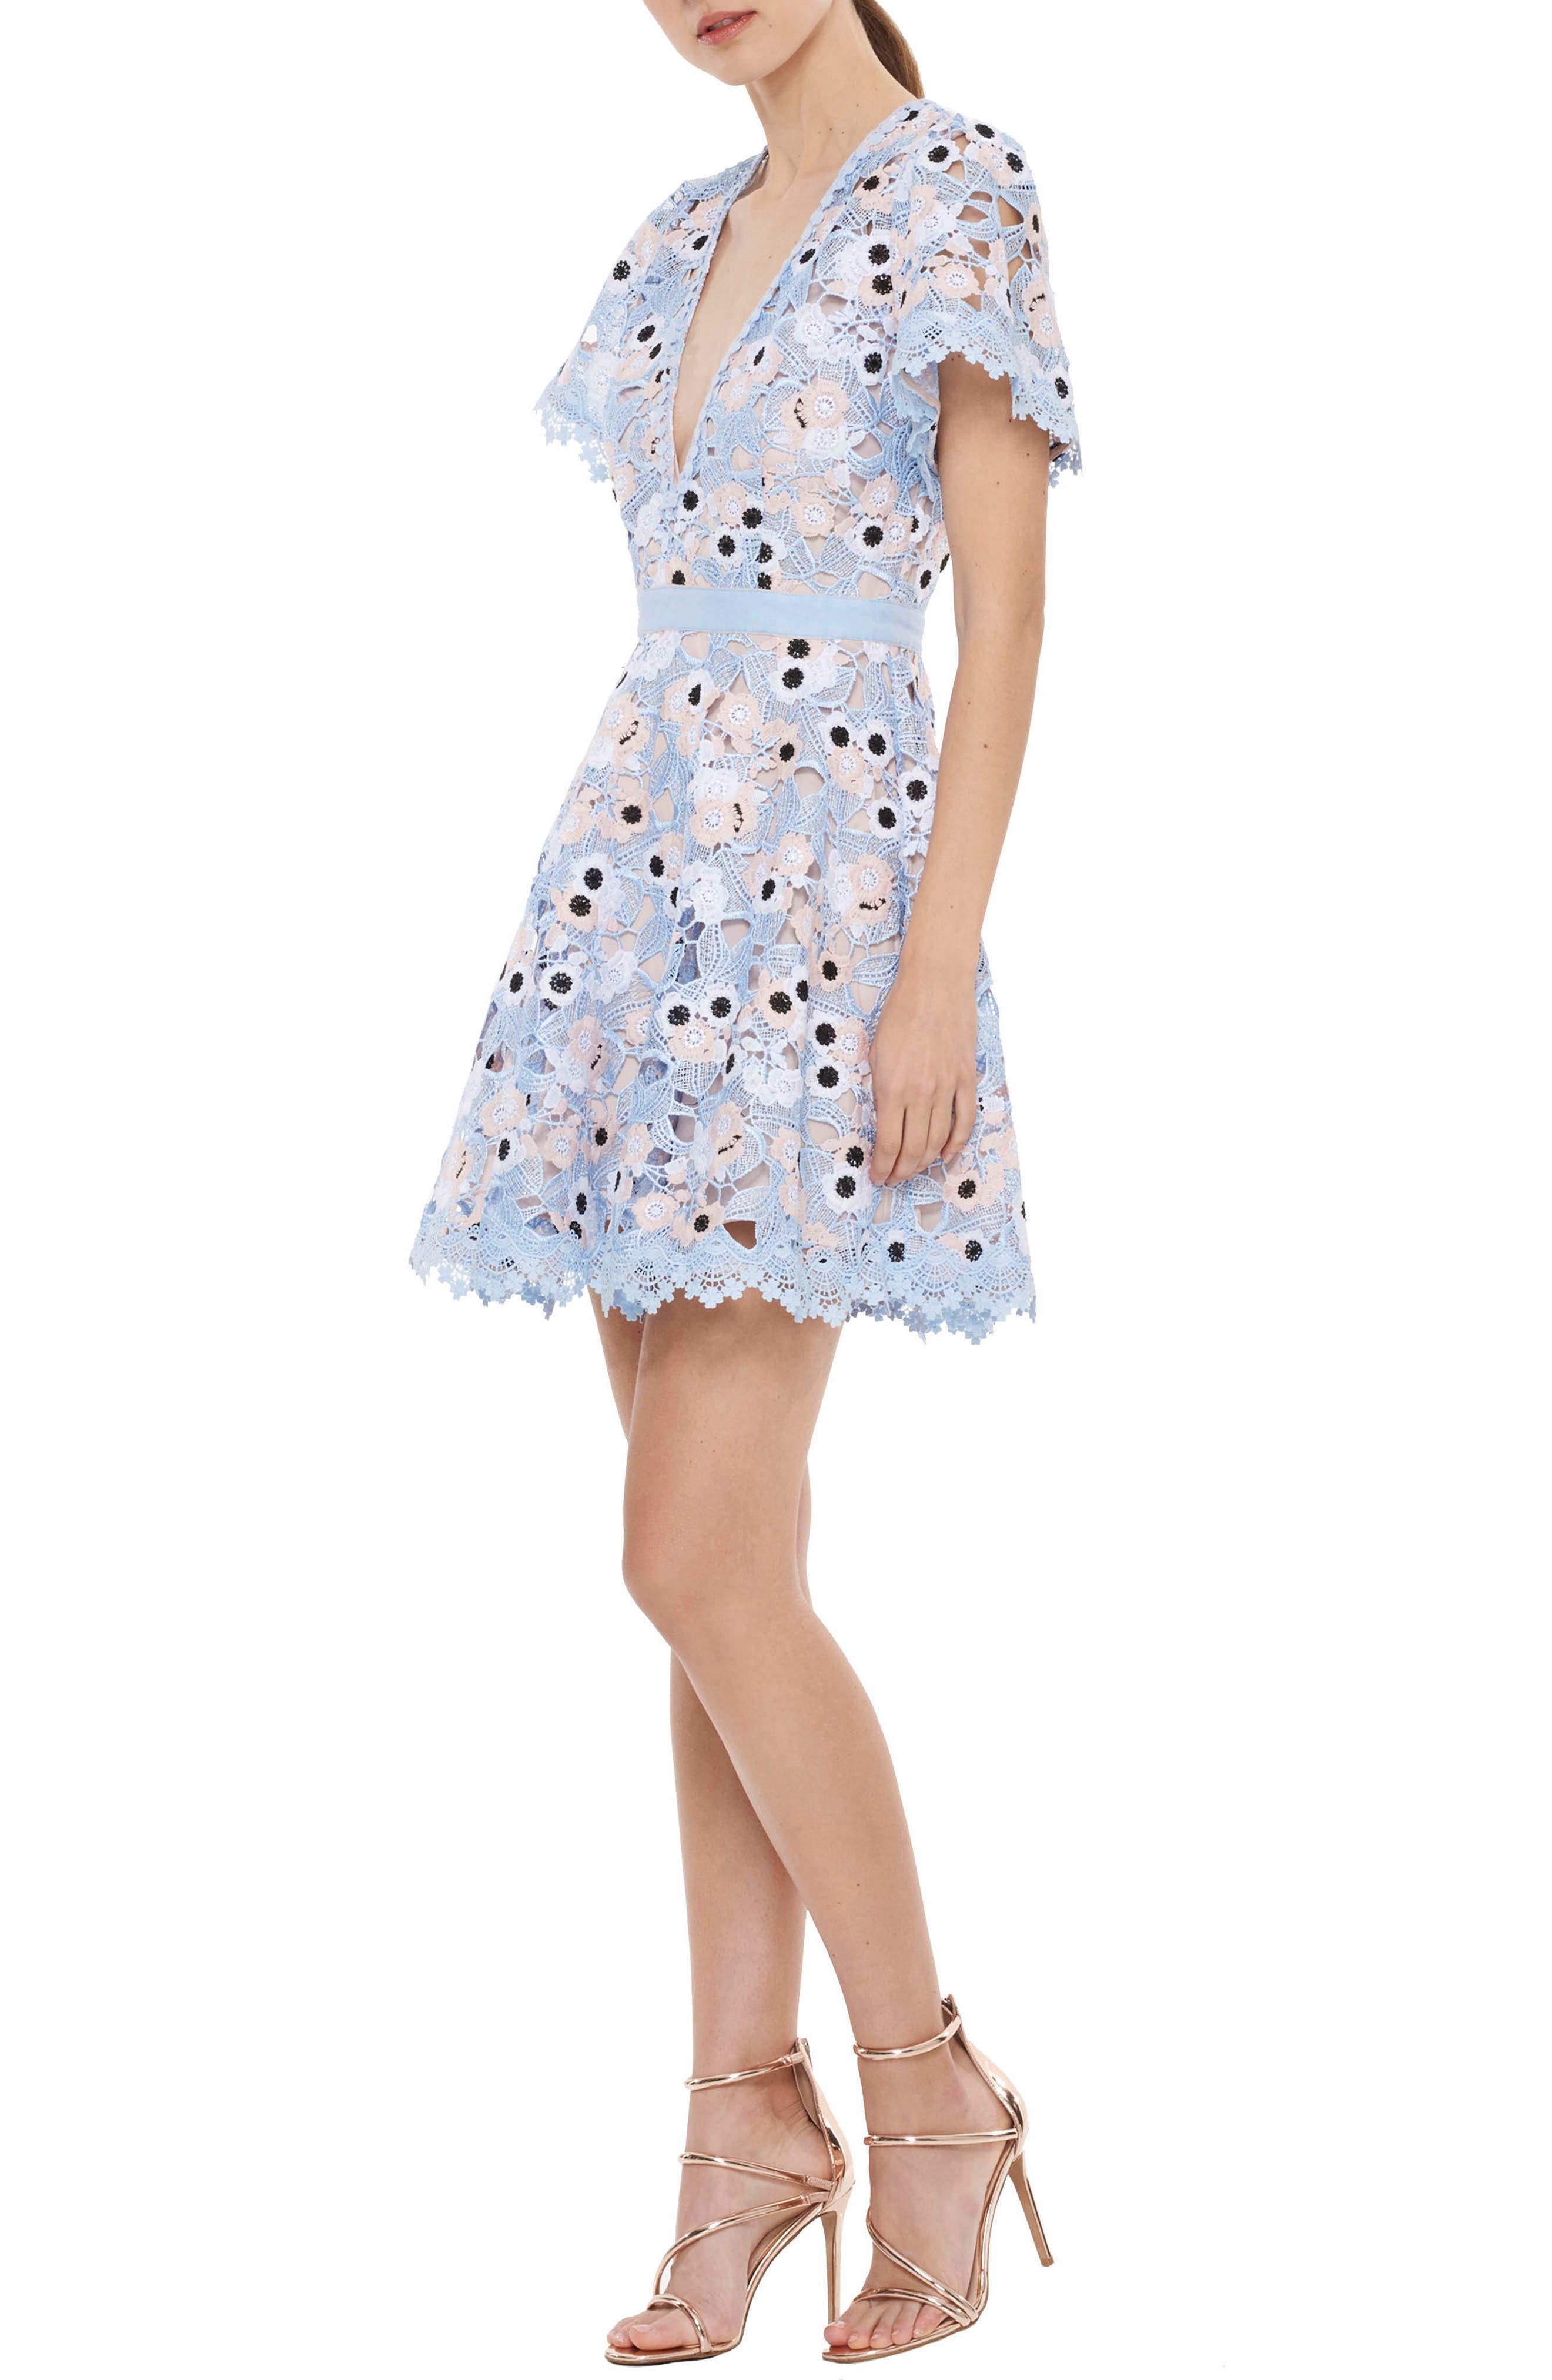 Infatuation Crochet Dress,                             Alternate thumbnail 3, color,                             450